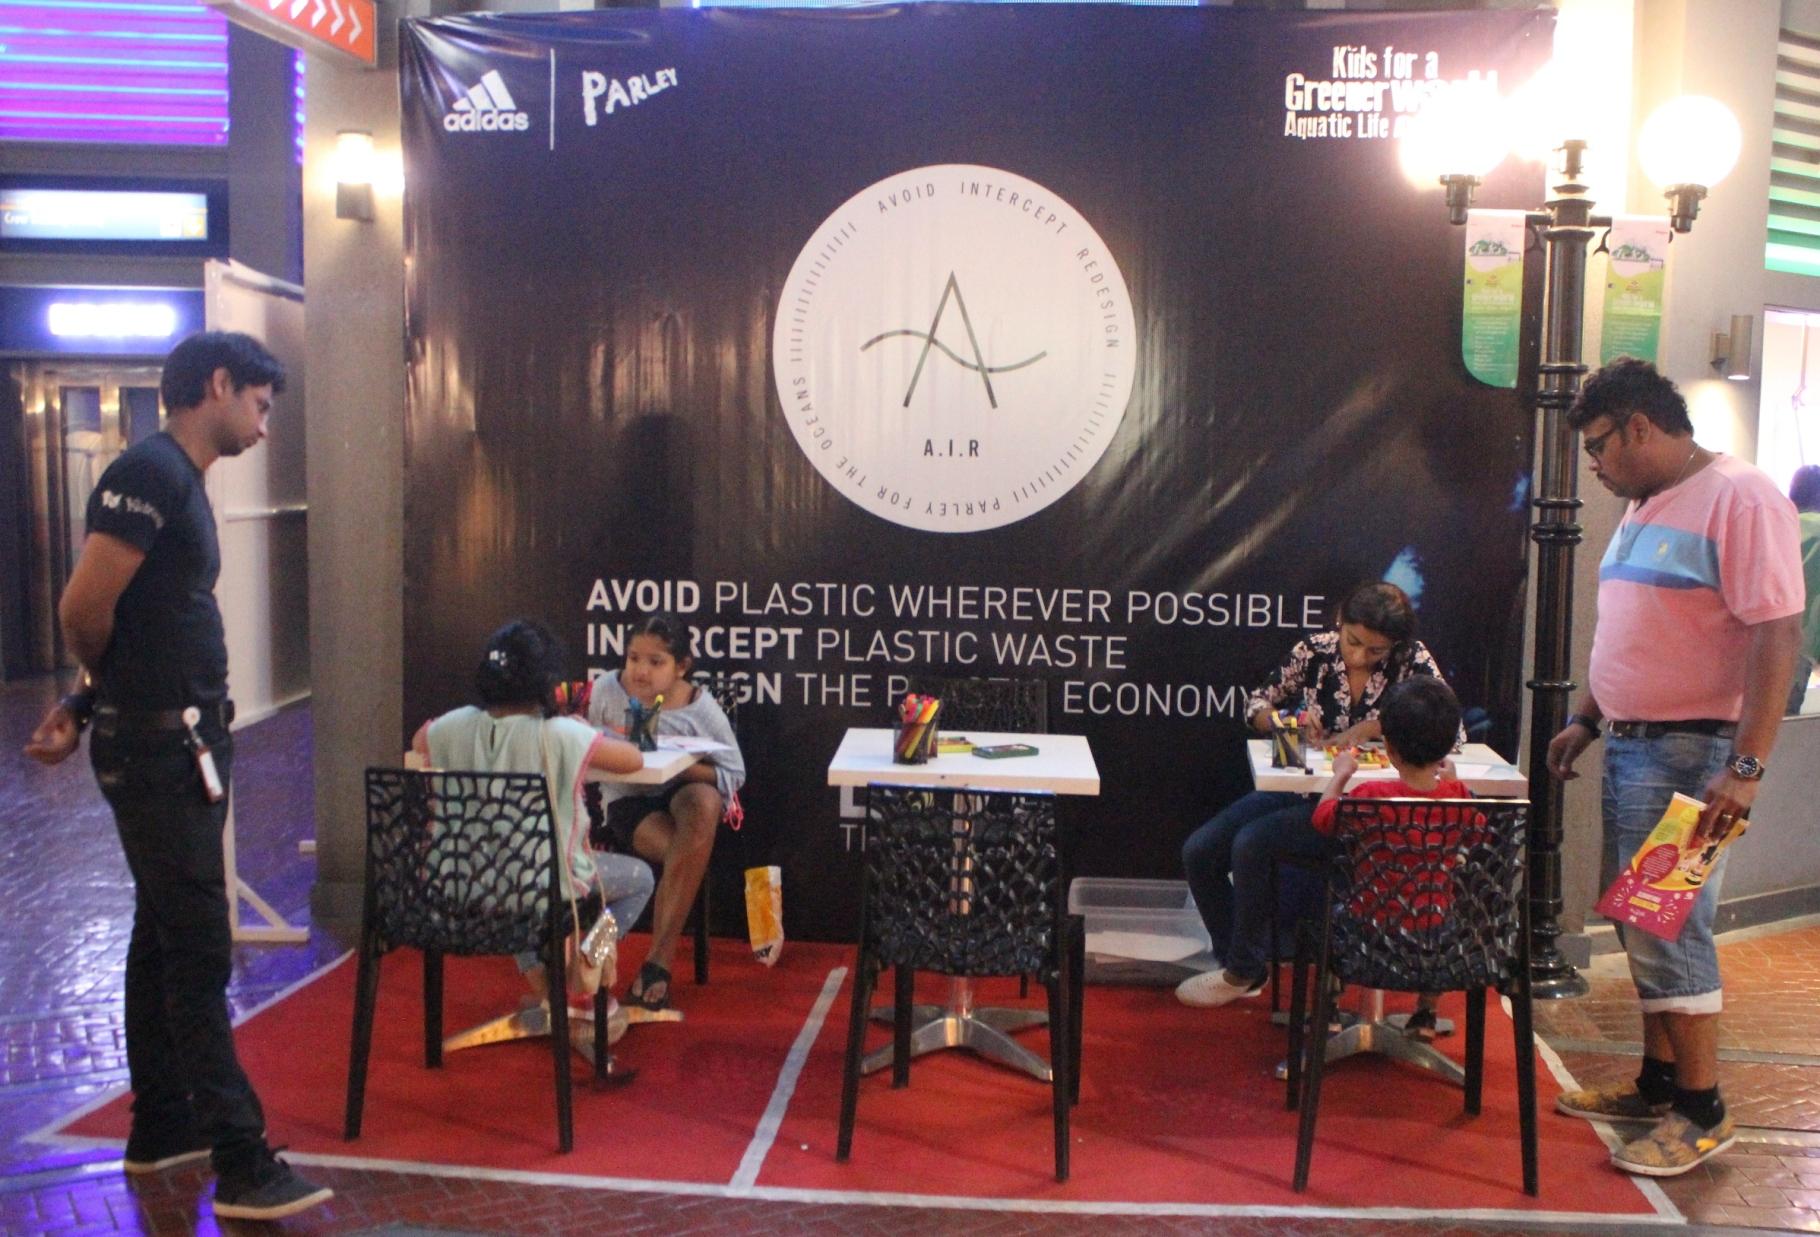 Aquatic Life - A Green Initiative by Adidas Parley at KidZania